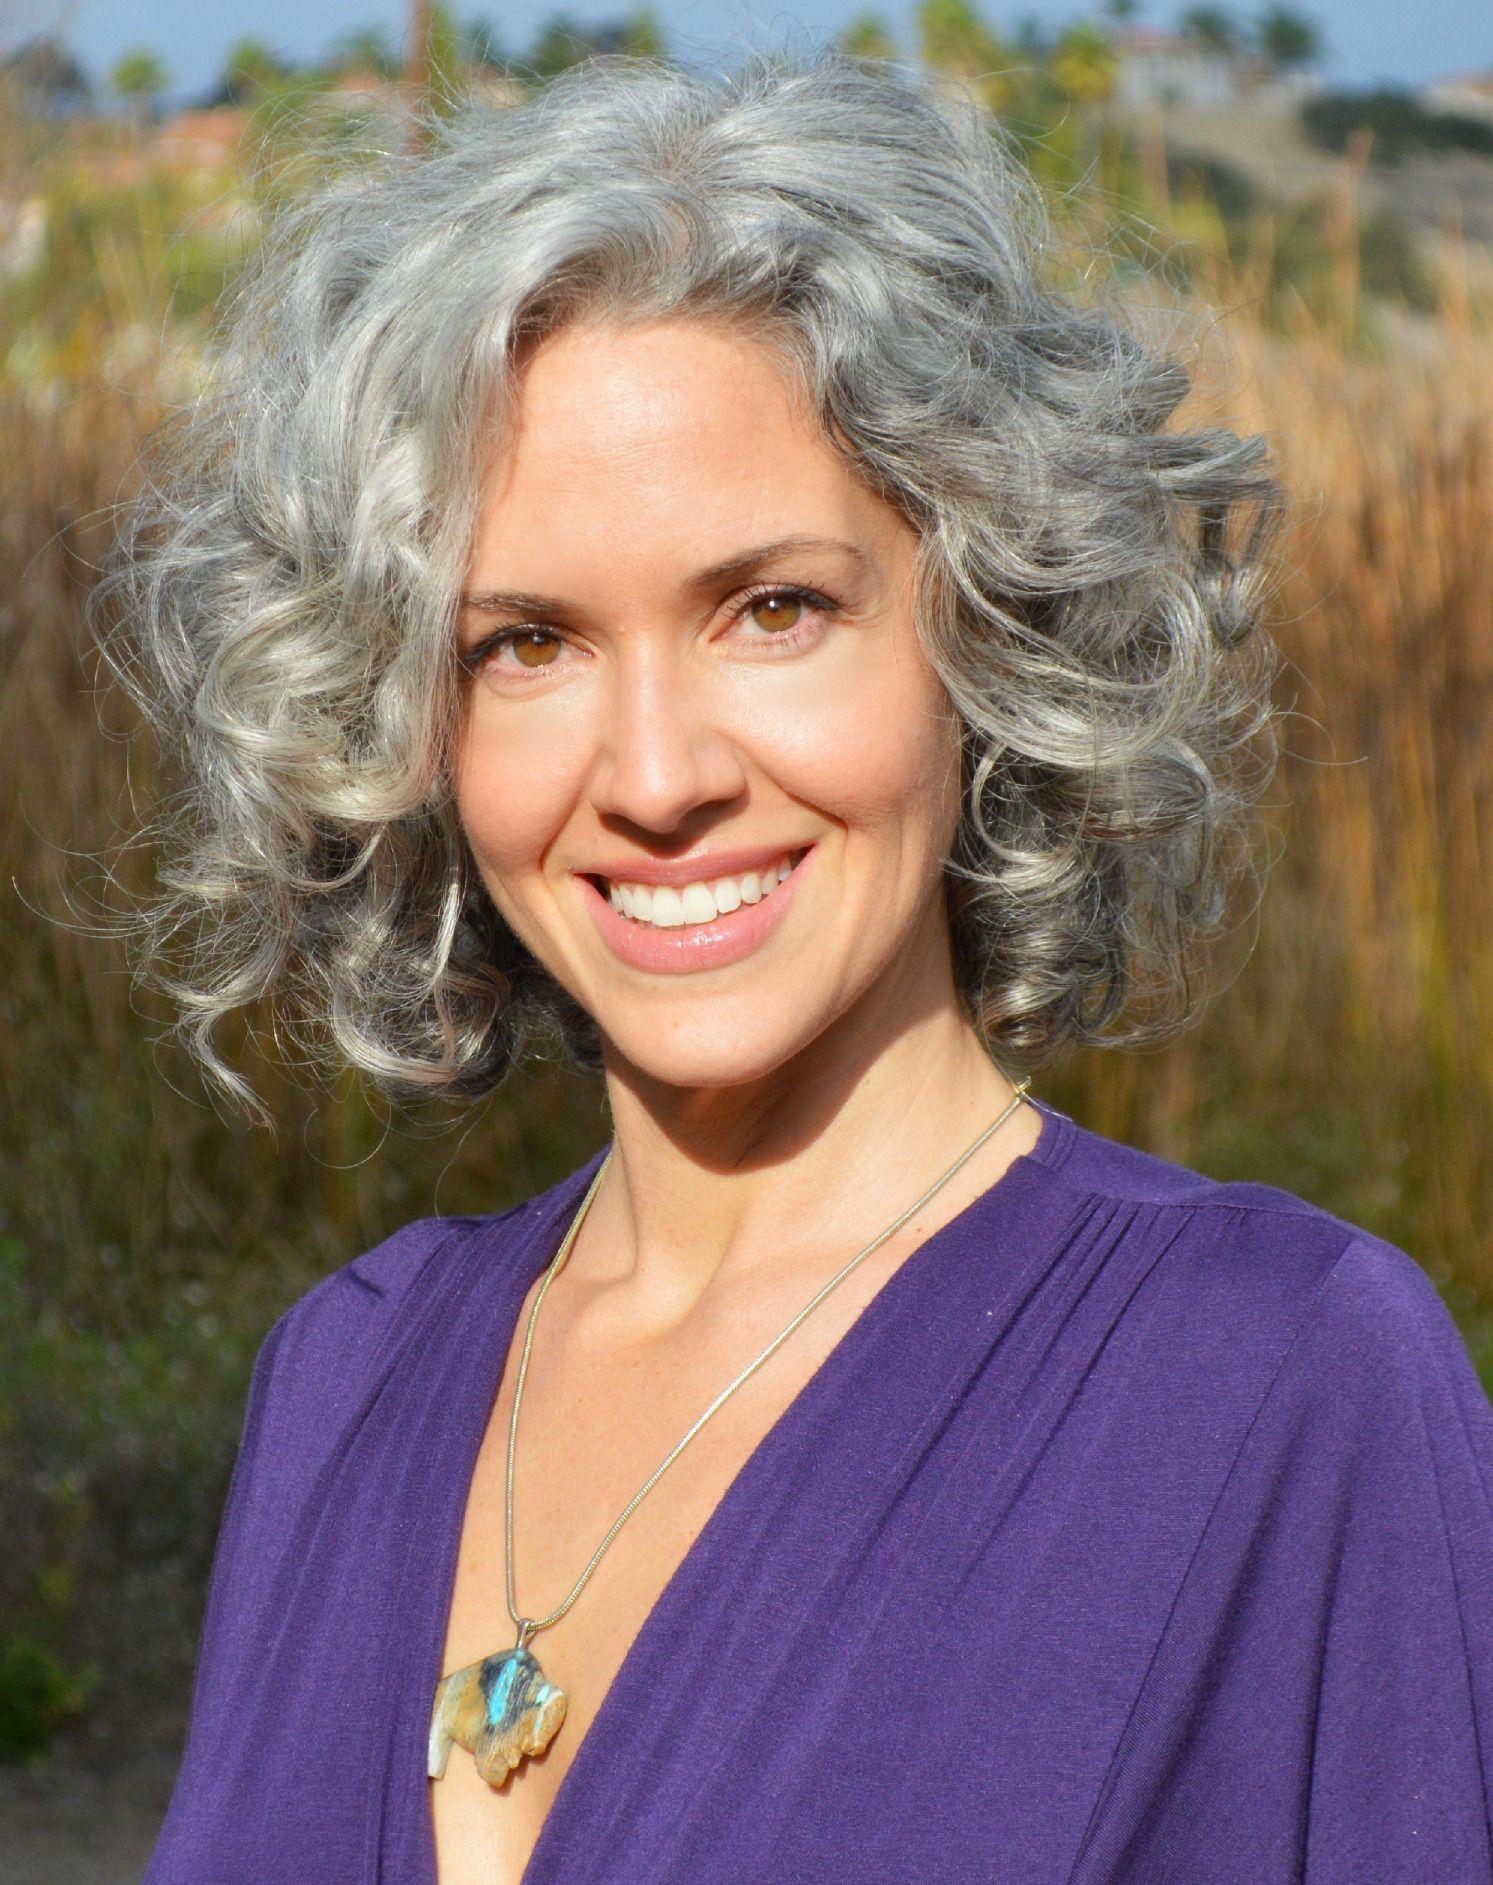 Sara Davis-Eisenman. Gorgeous silver curls, great smile - lovely ...